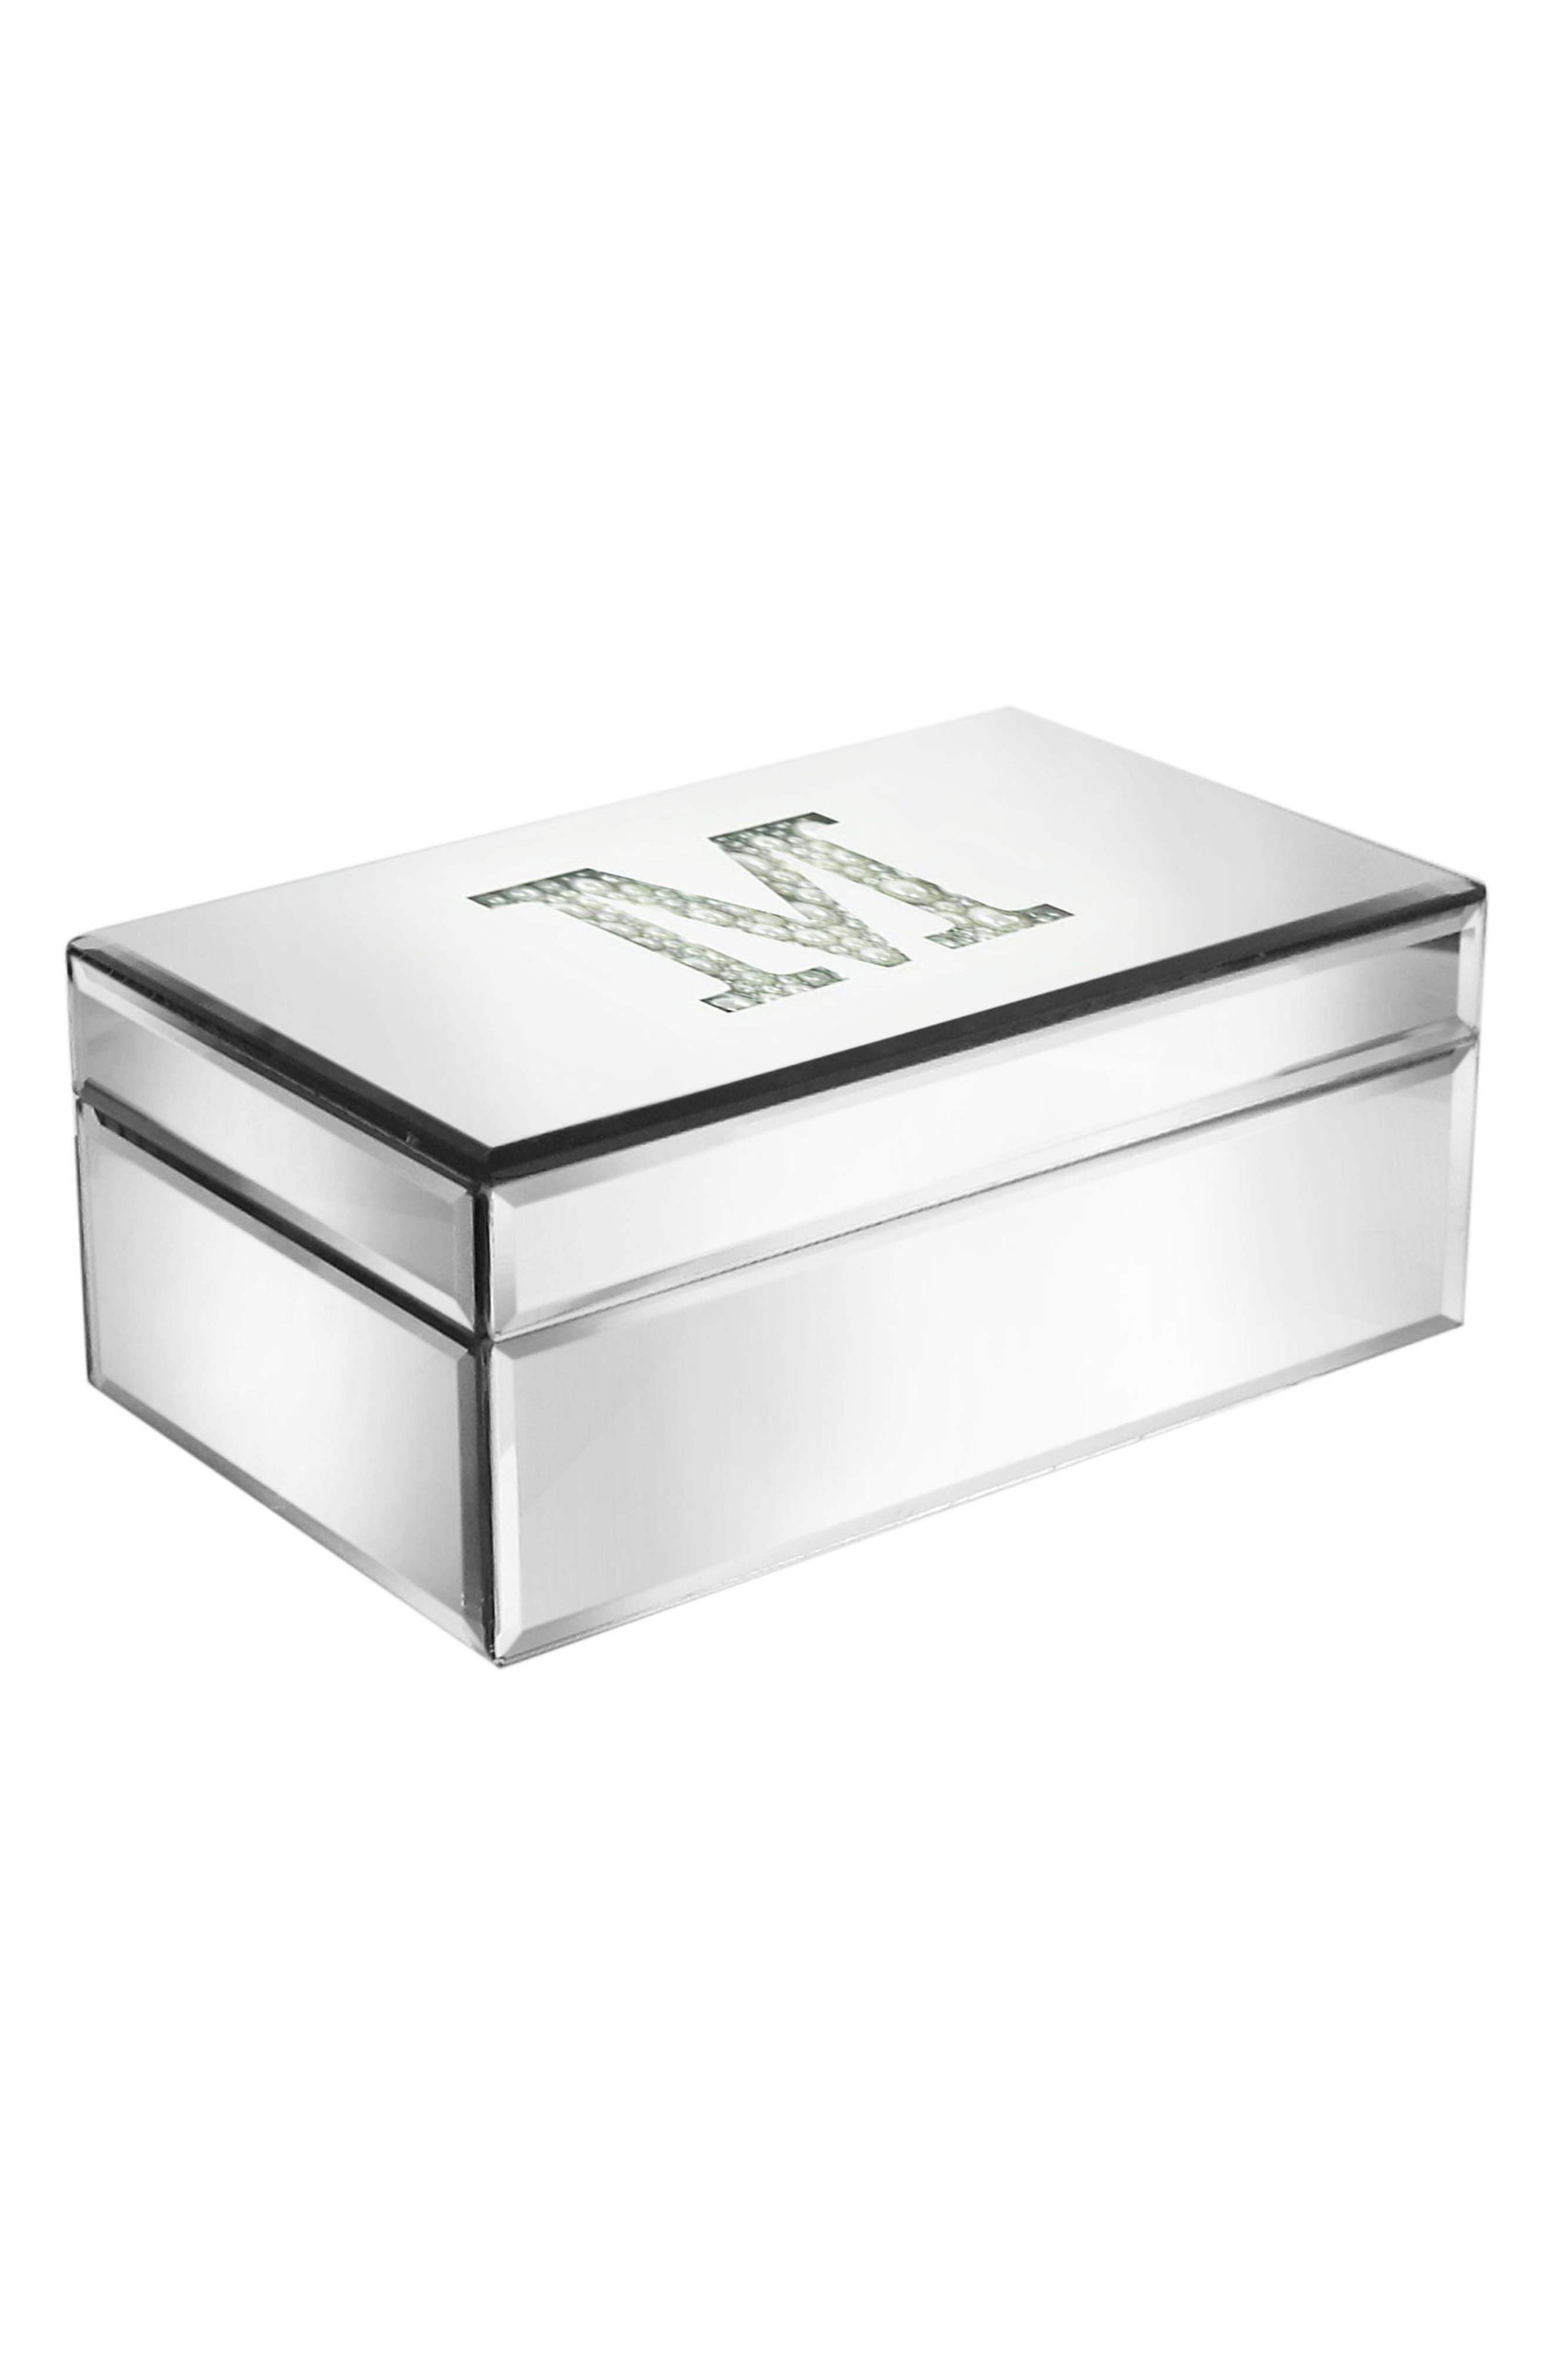 Imitation Pearl Monogram Mirrored Jewelry Box,                         Main,                         color, 040